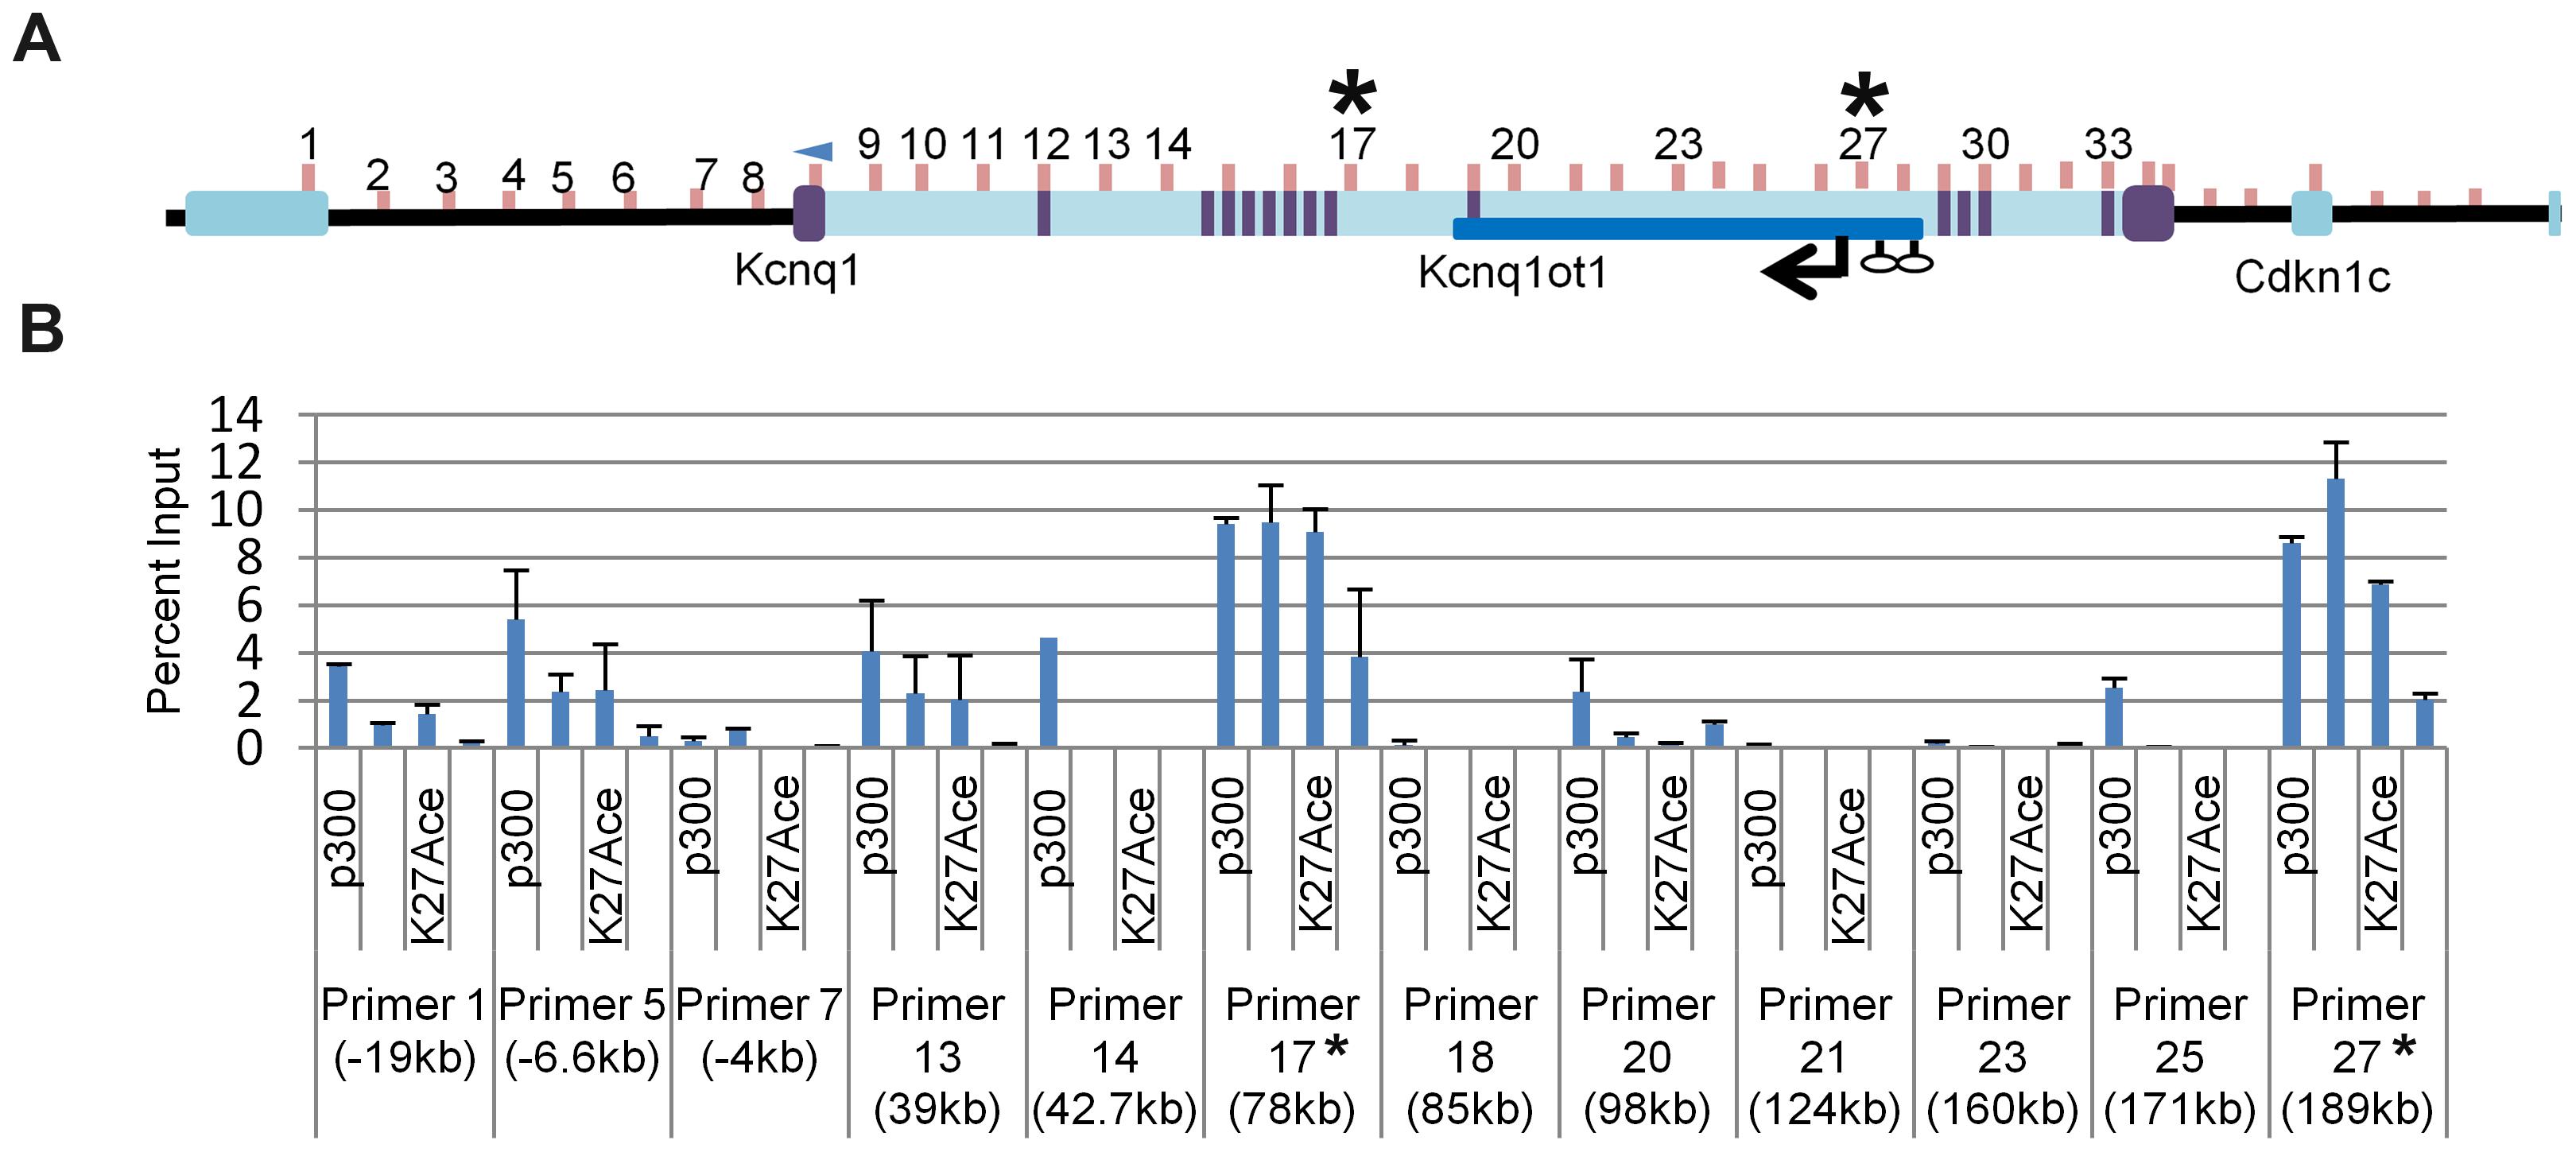 Chromatin immunoprecipitation (ChIP) of selected regions of the <i>Kcnq1</i> gene.